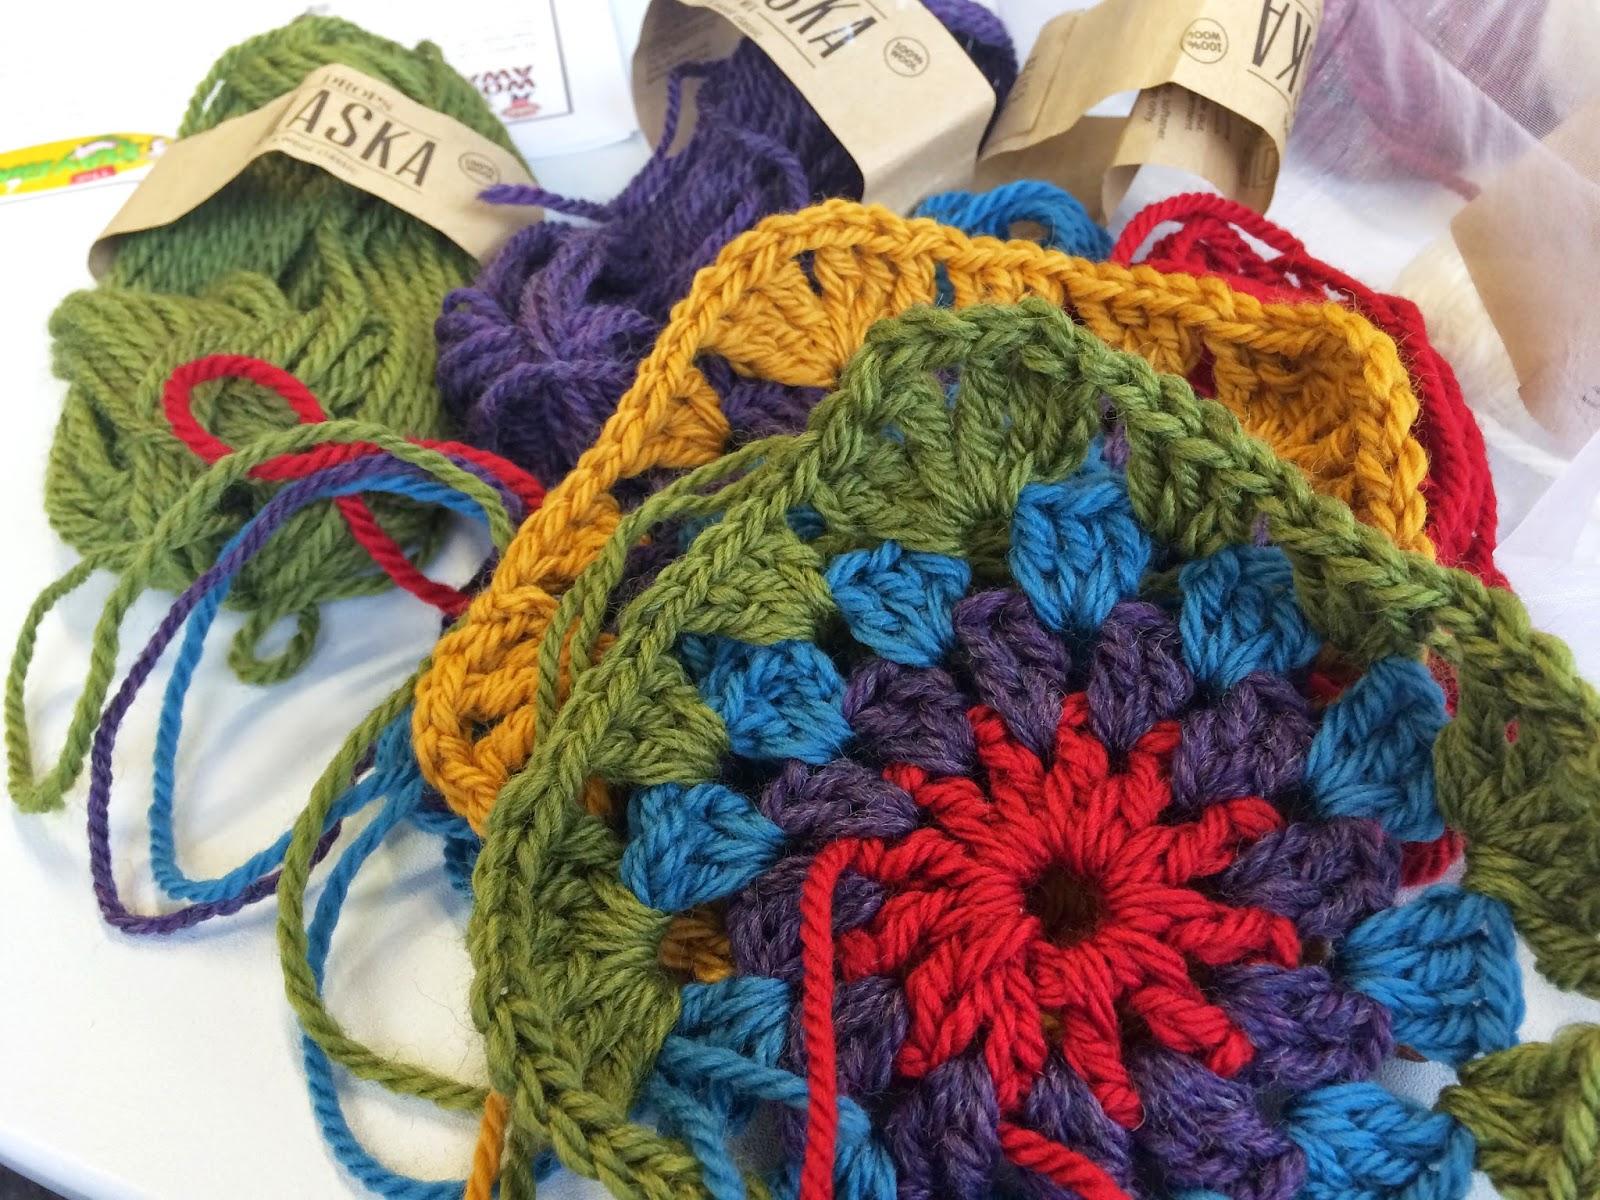 Designing a crochet granny blanket